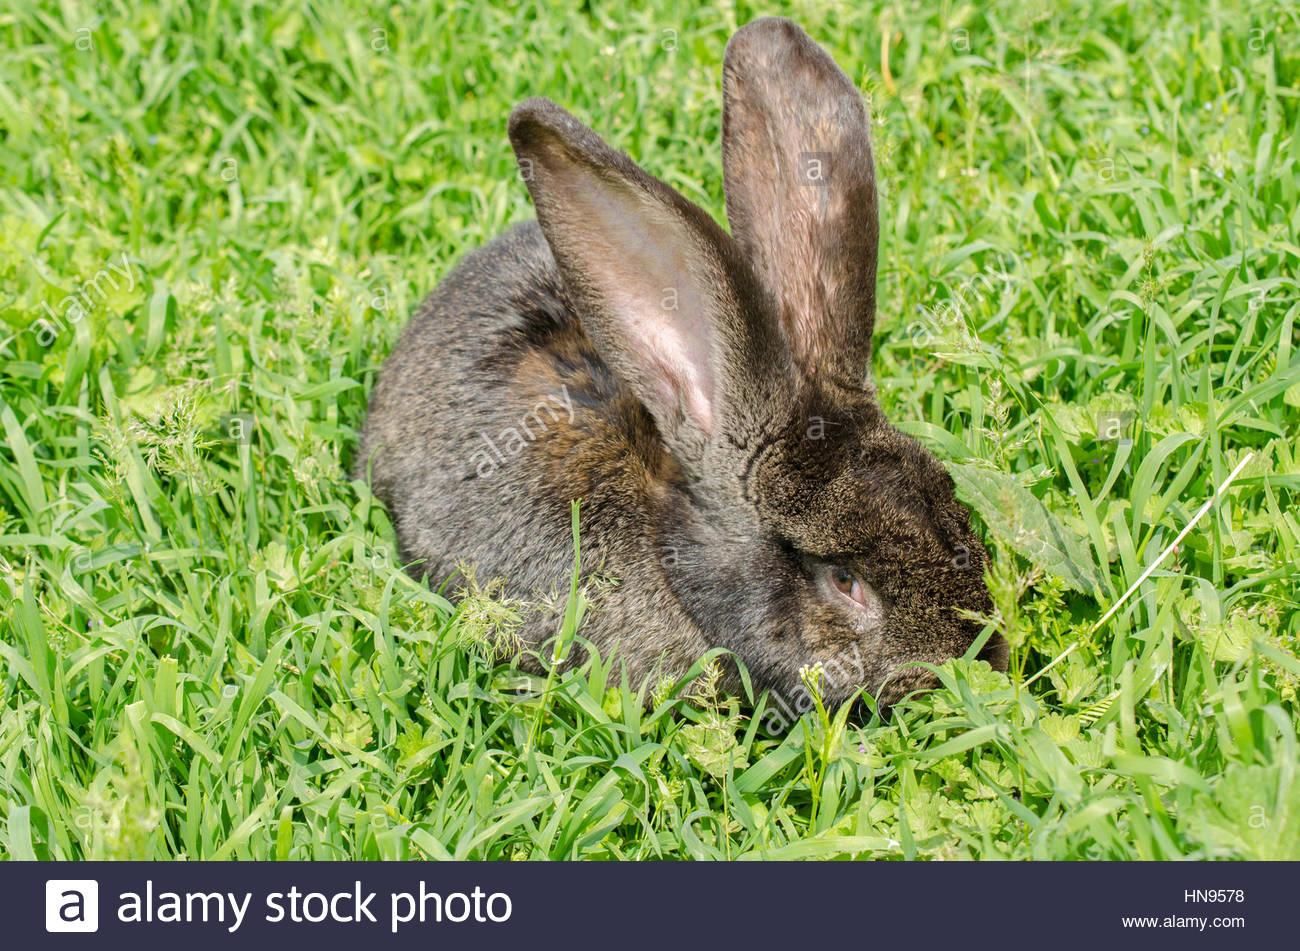 Black rabbit on green grass in spring - Stock Image